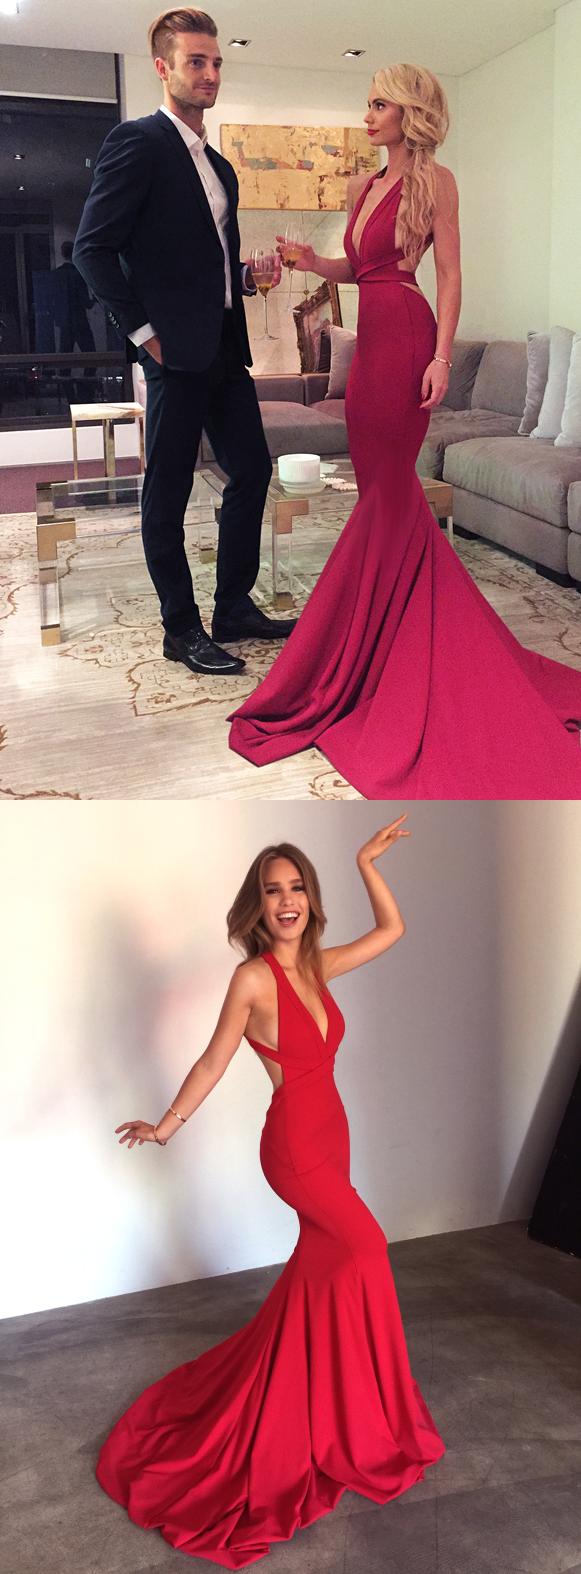 2017 long prom dress, red long prom dress, mermaid long prom dress, formal evening dress